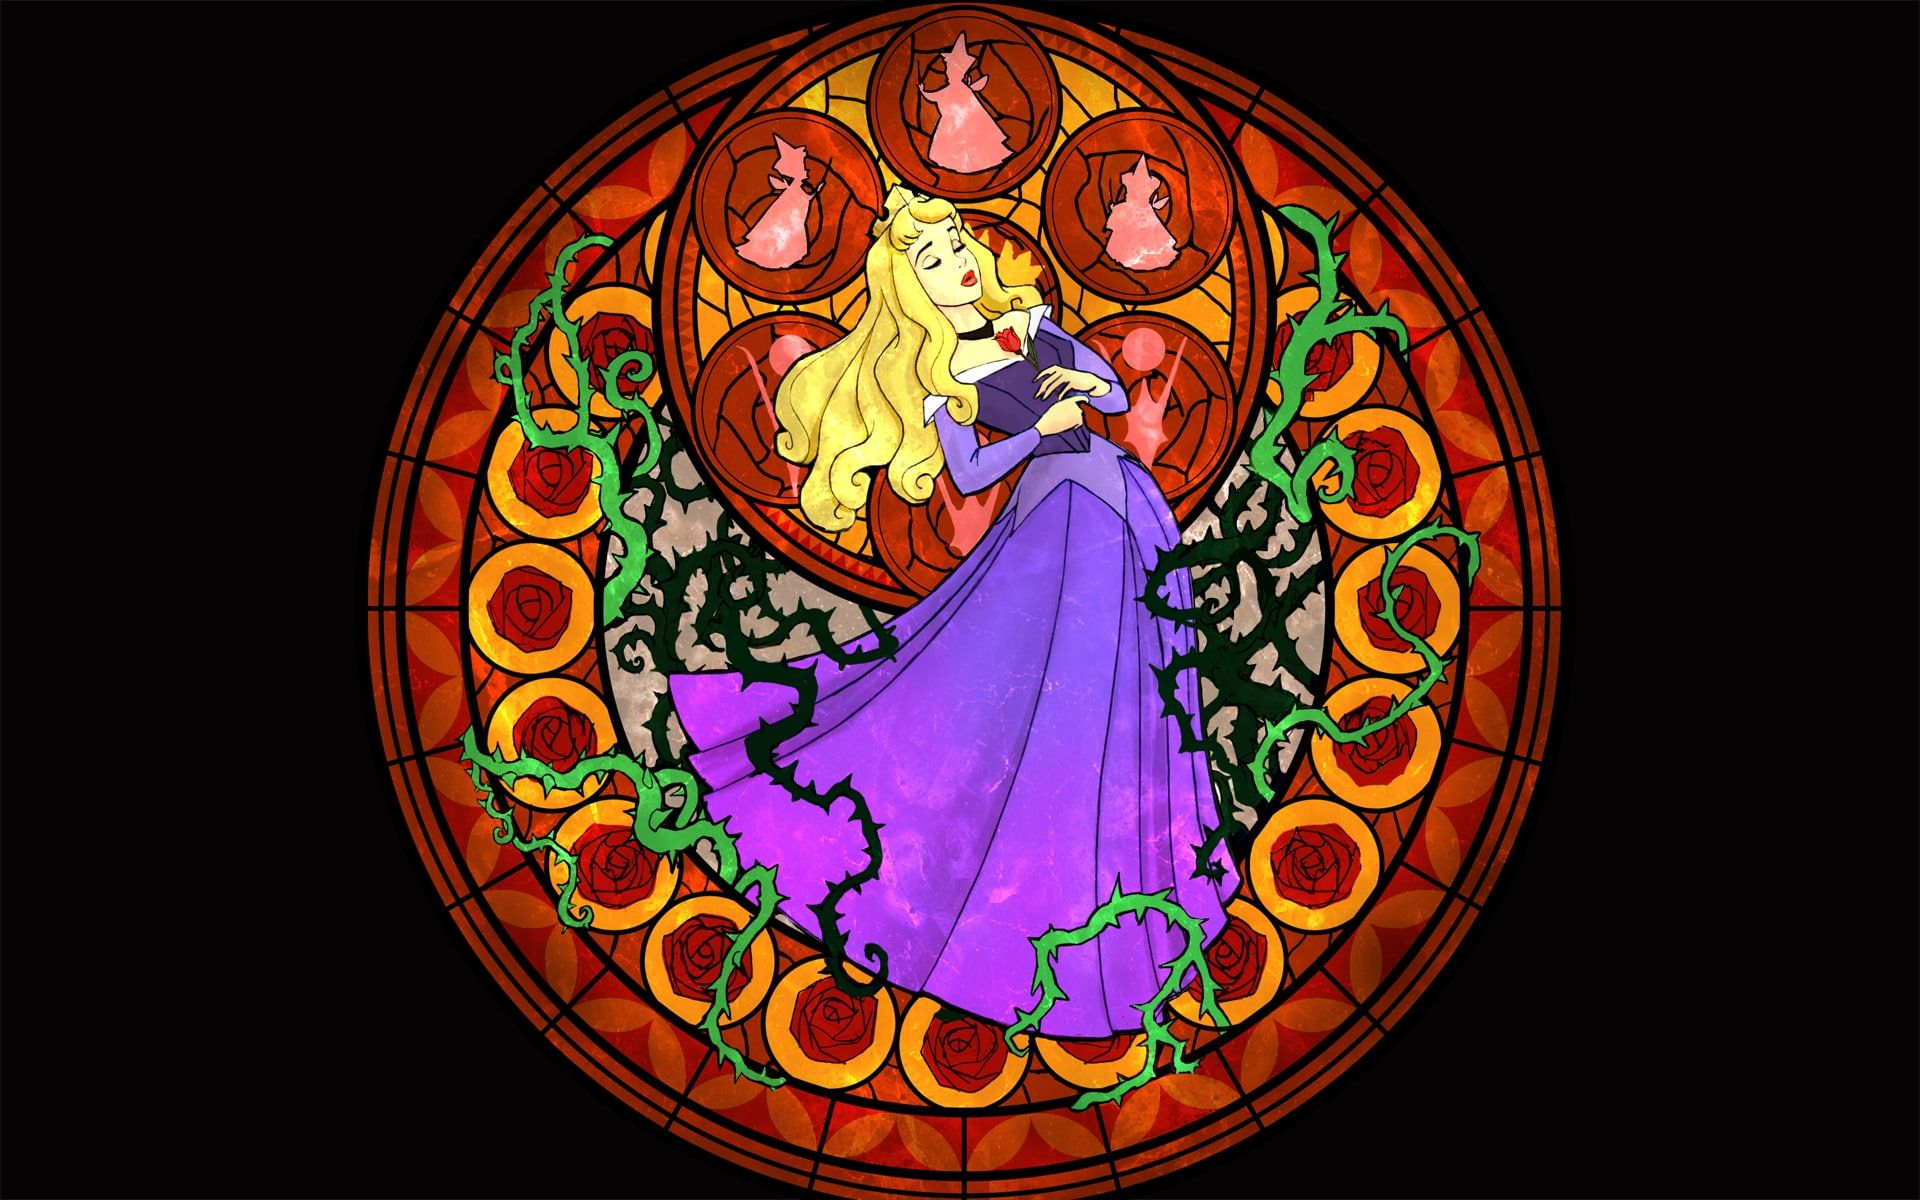 kingdom hearts sleeping beauty stained glass 1920x1200